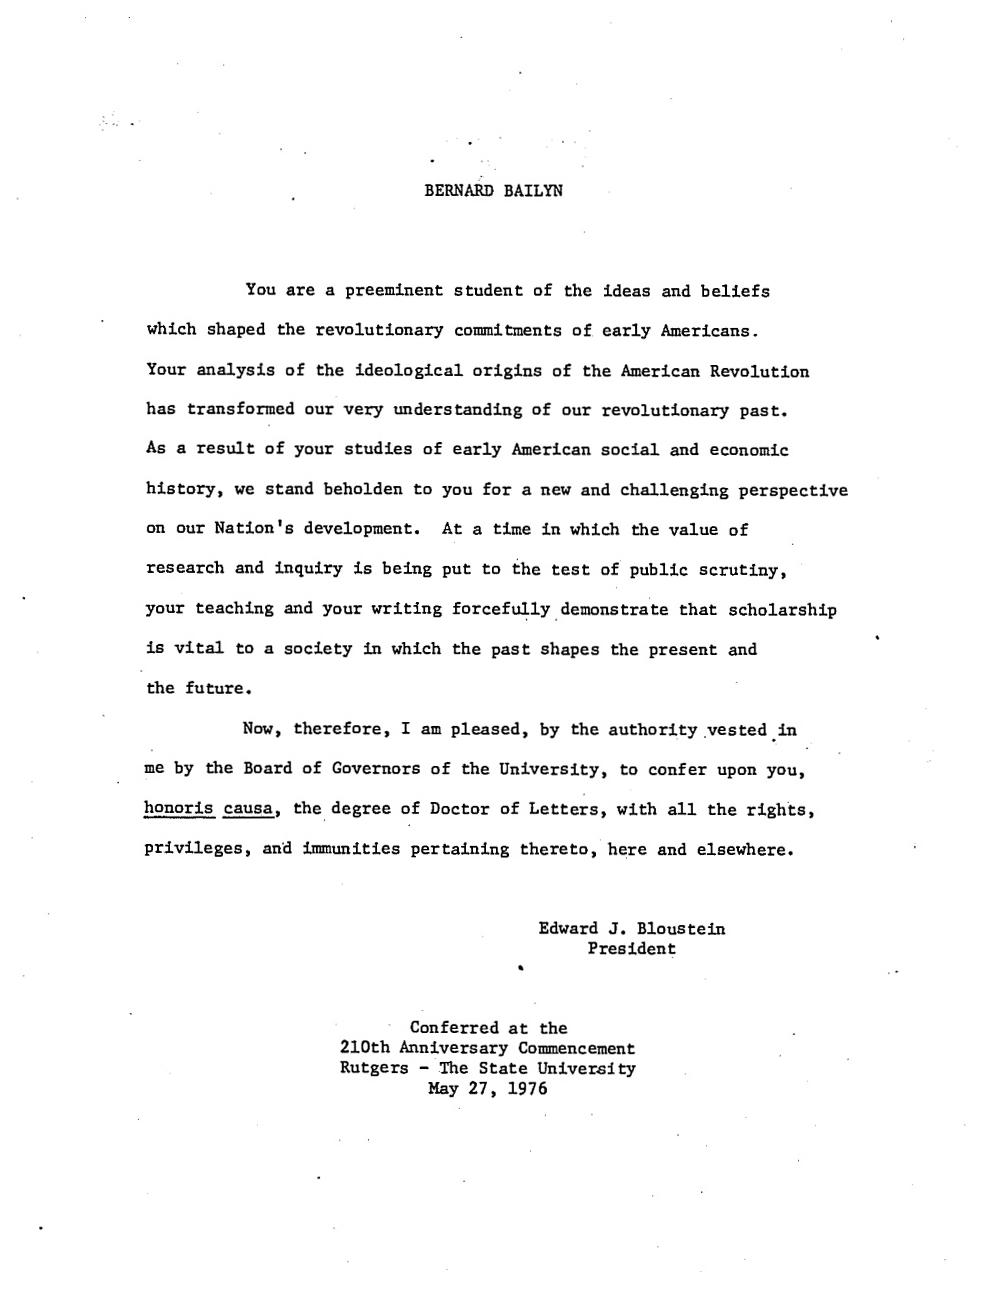 bailyn. Baker, Russell Wayne, 1989, Doctor of Letters